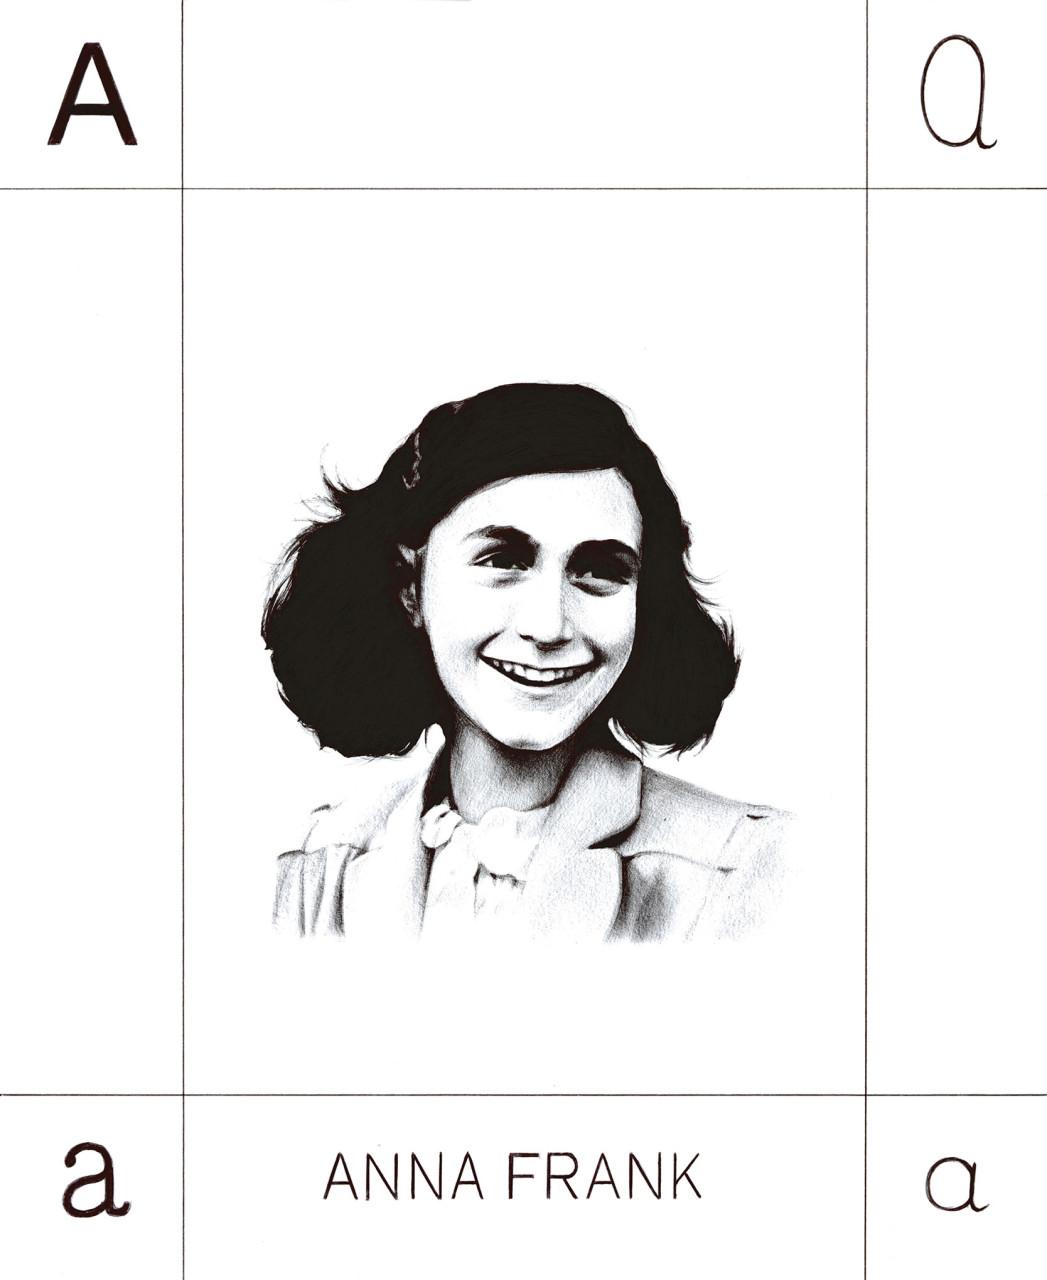 08A-anna frank_bassa